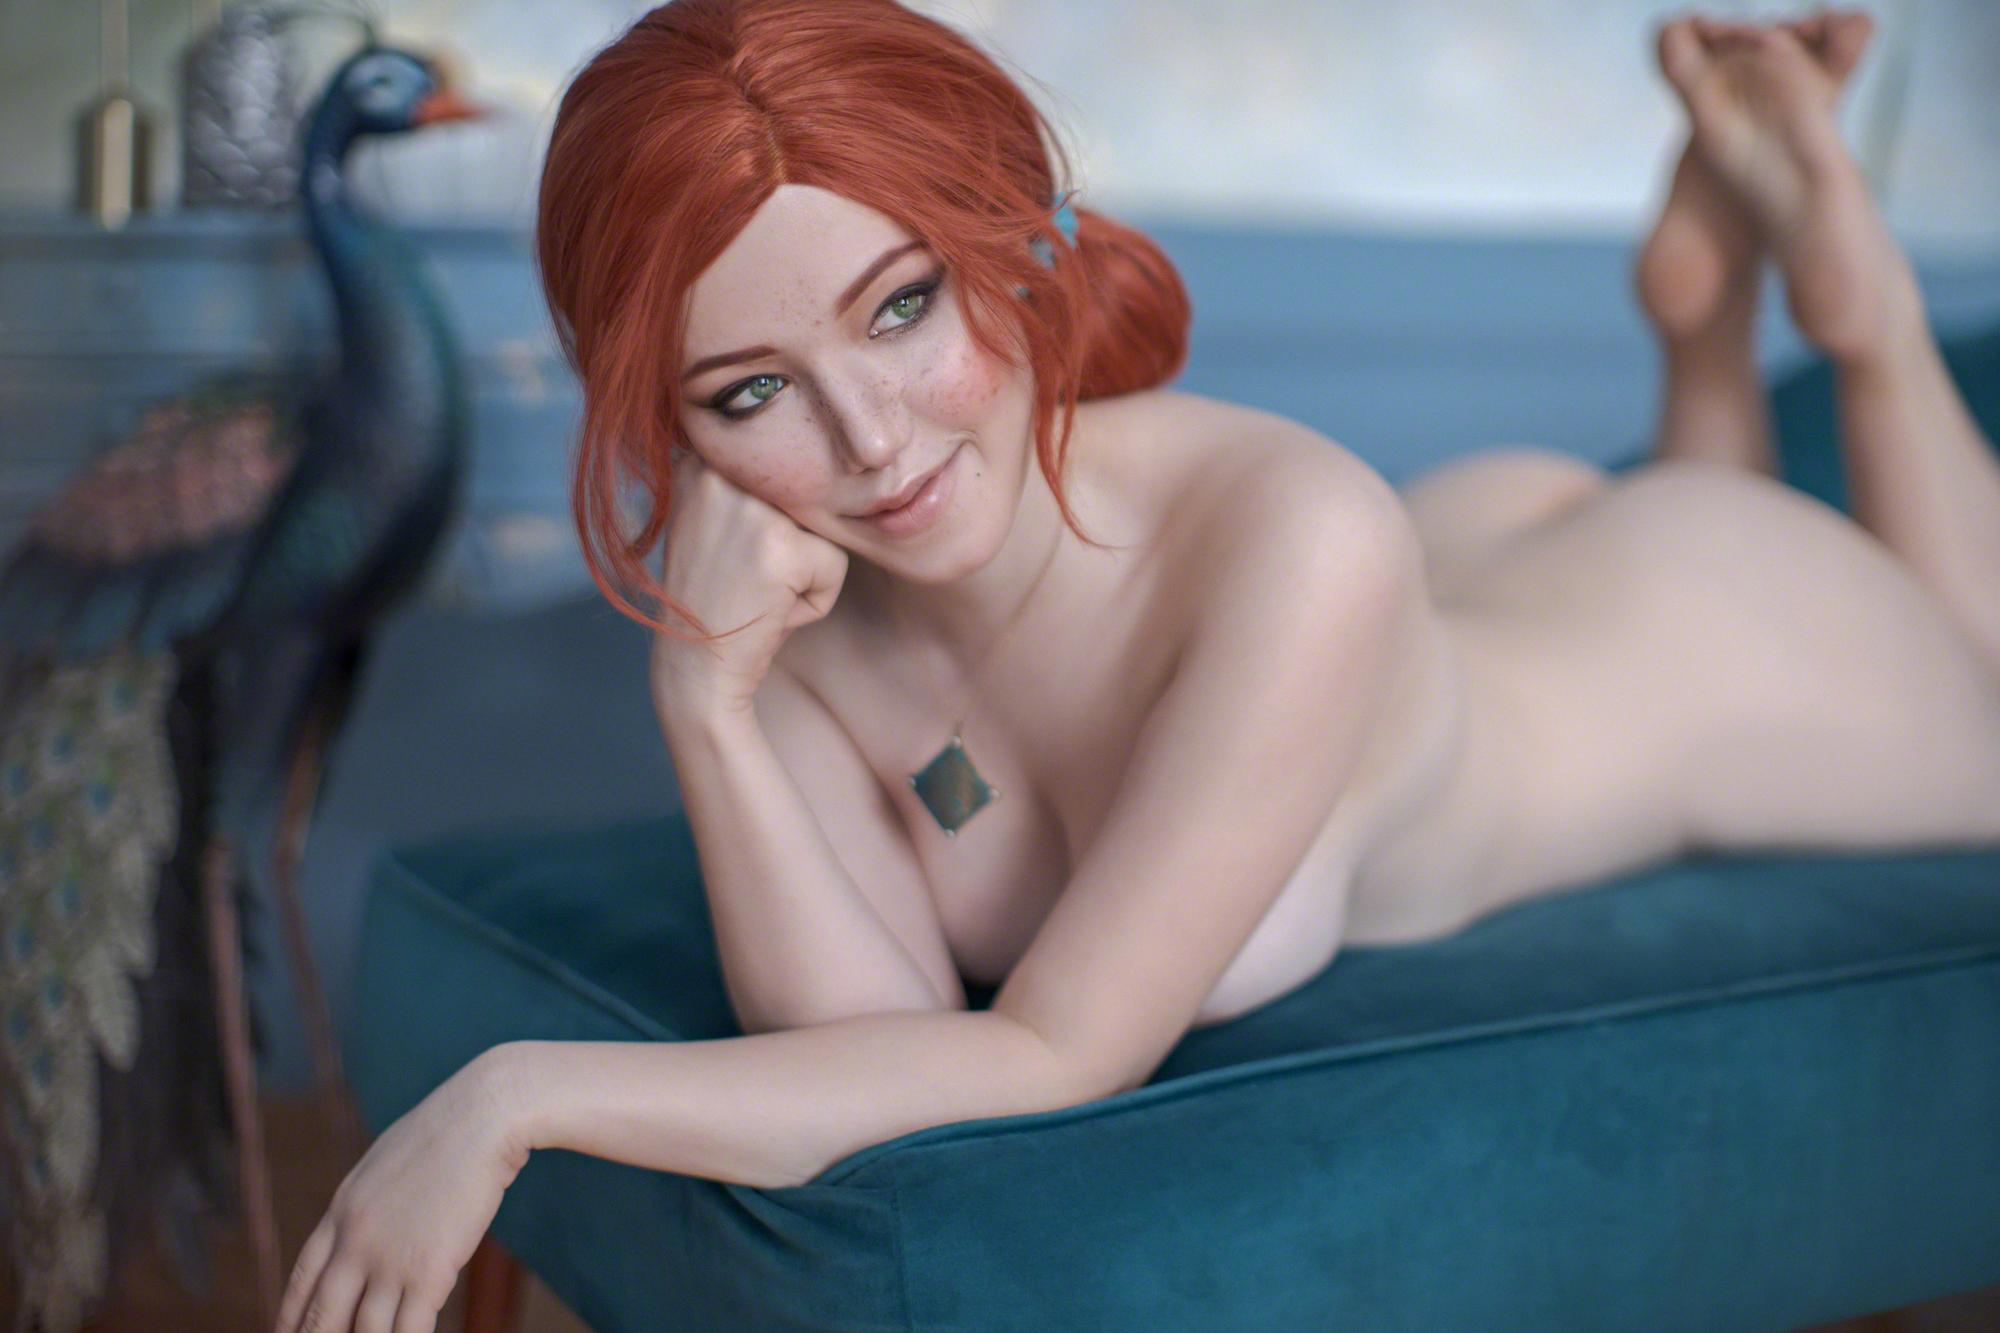 Leaked Nude Set From Lada Lyumos Patreon 0027